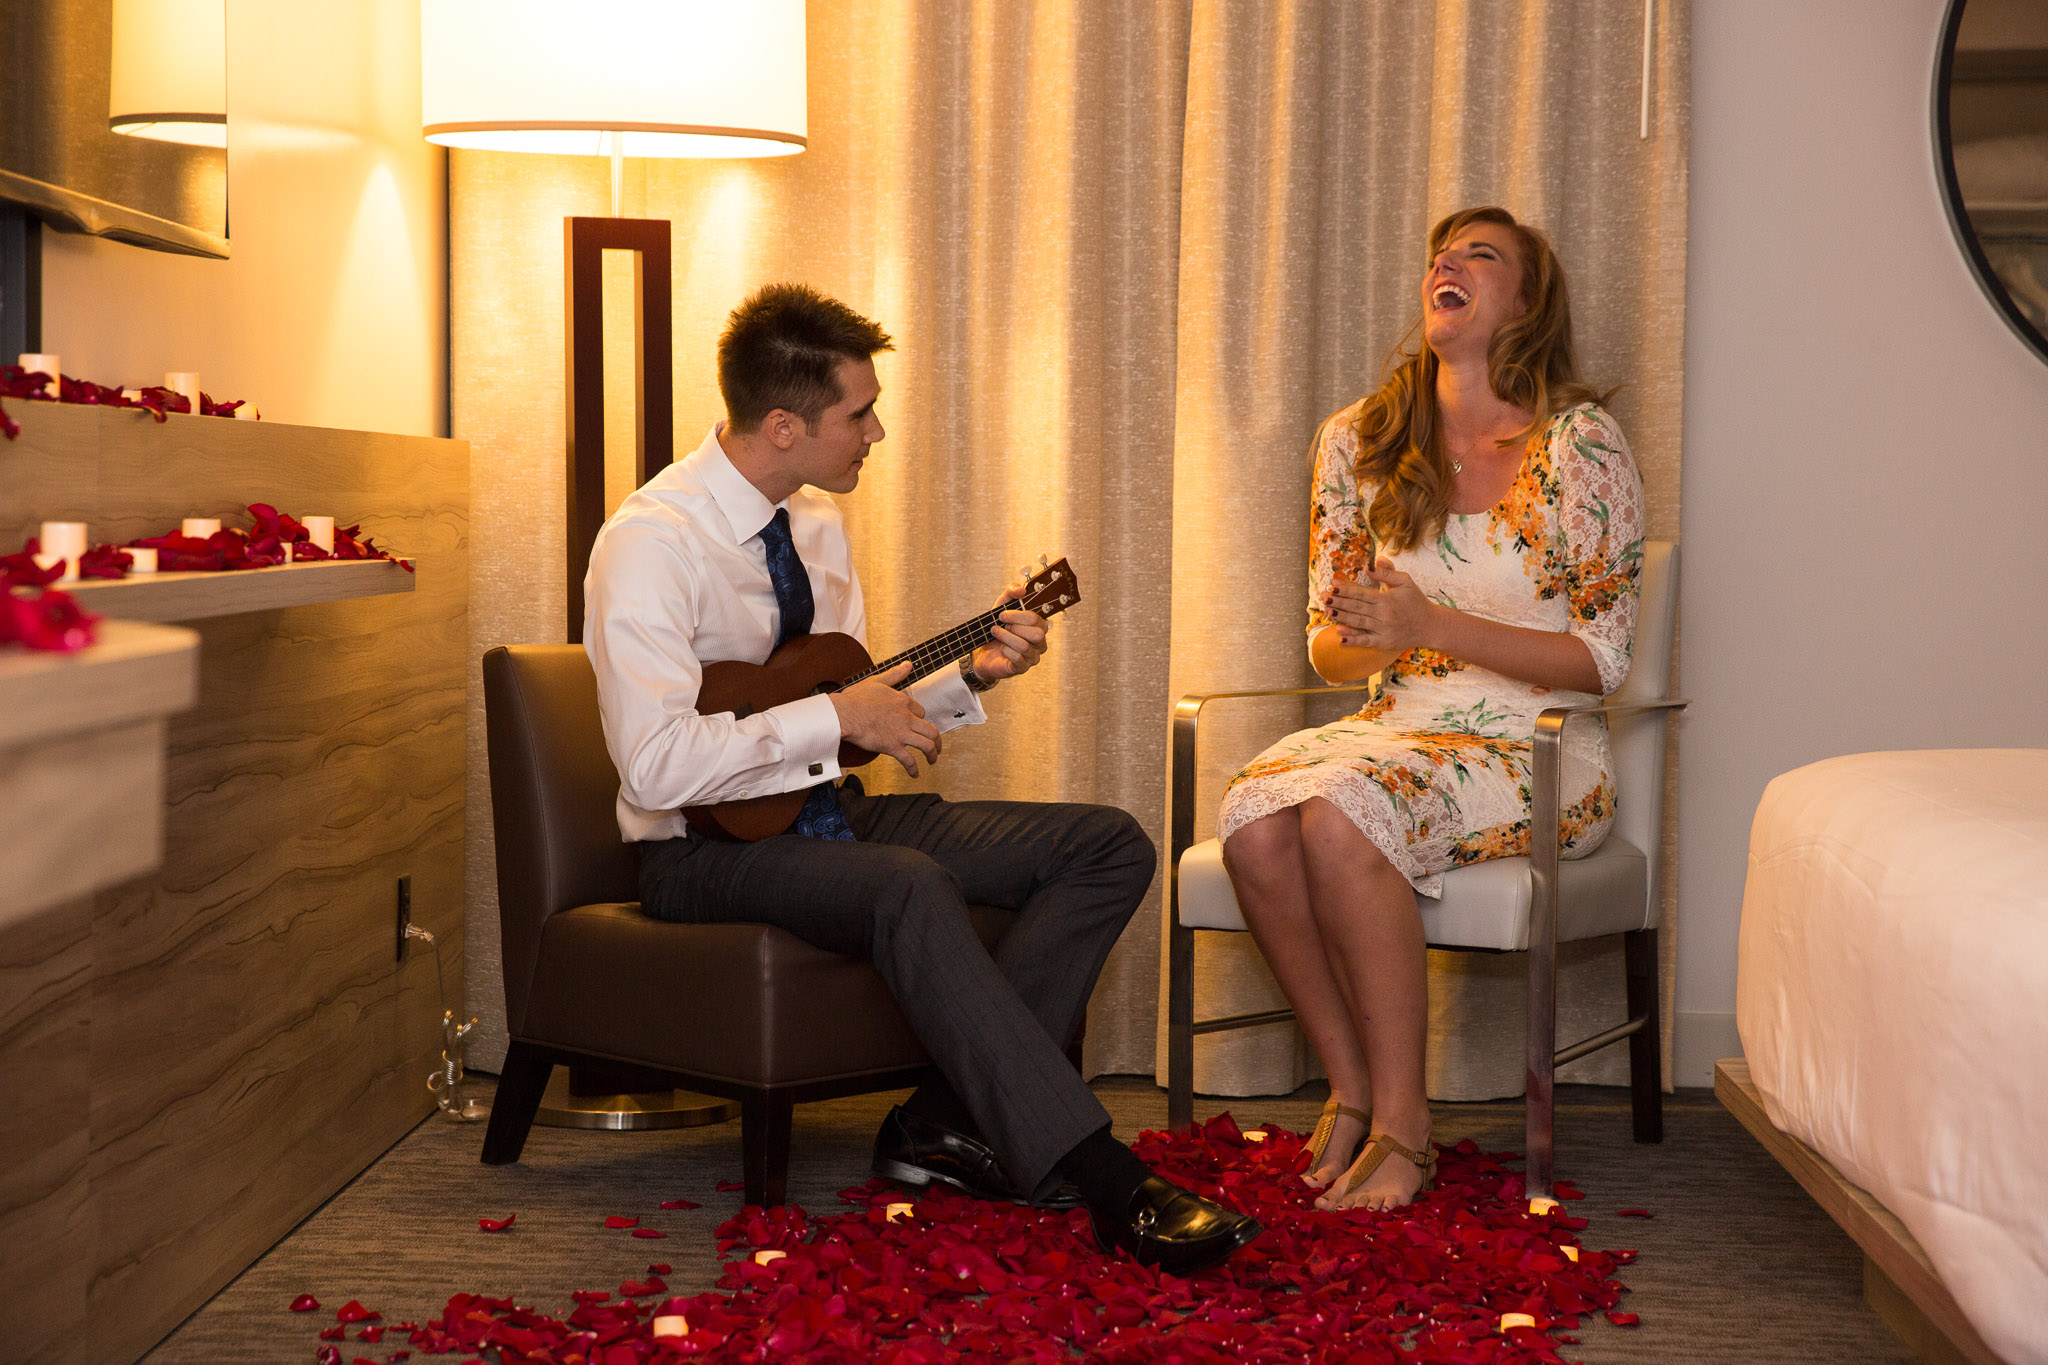 Romantic-proposal-ukelele